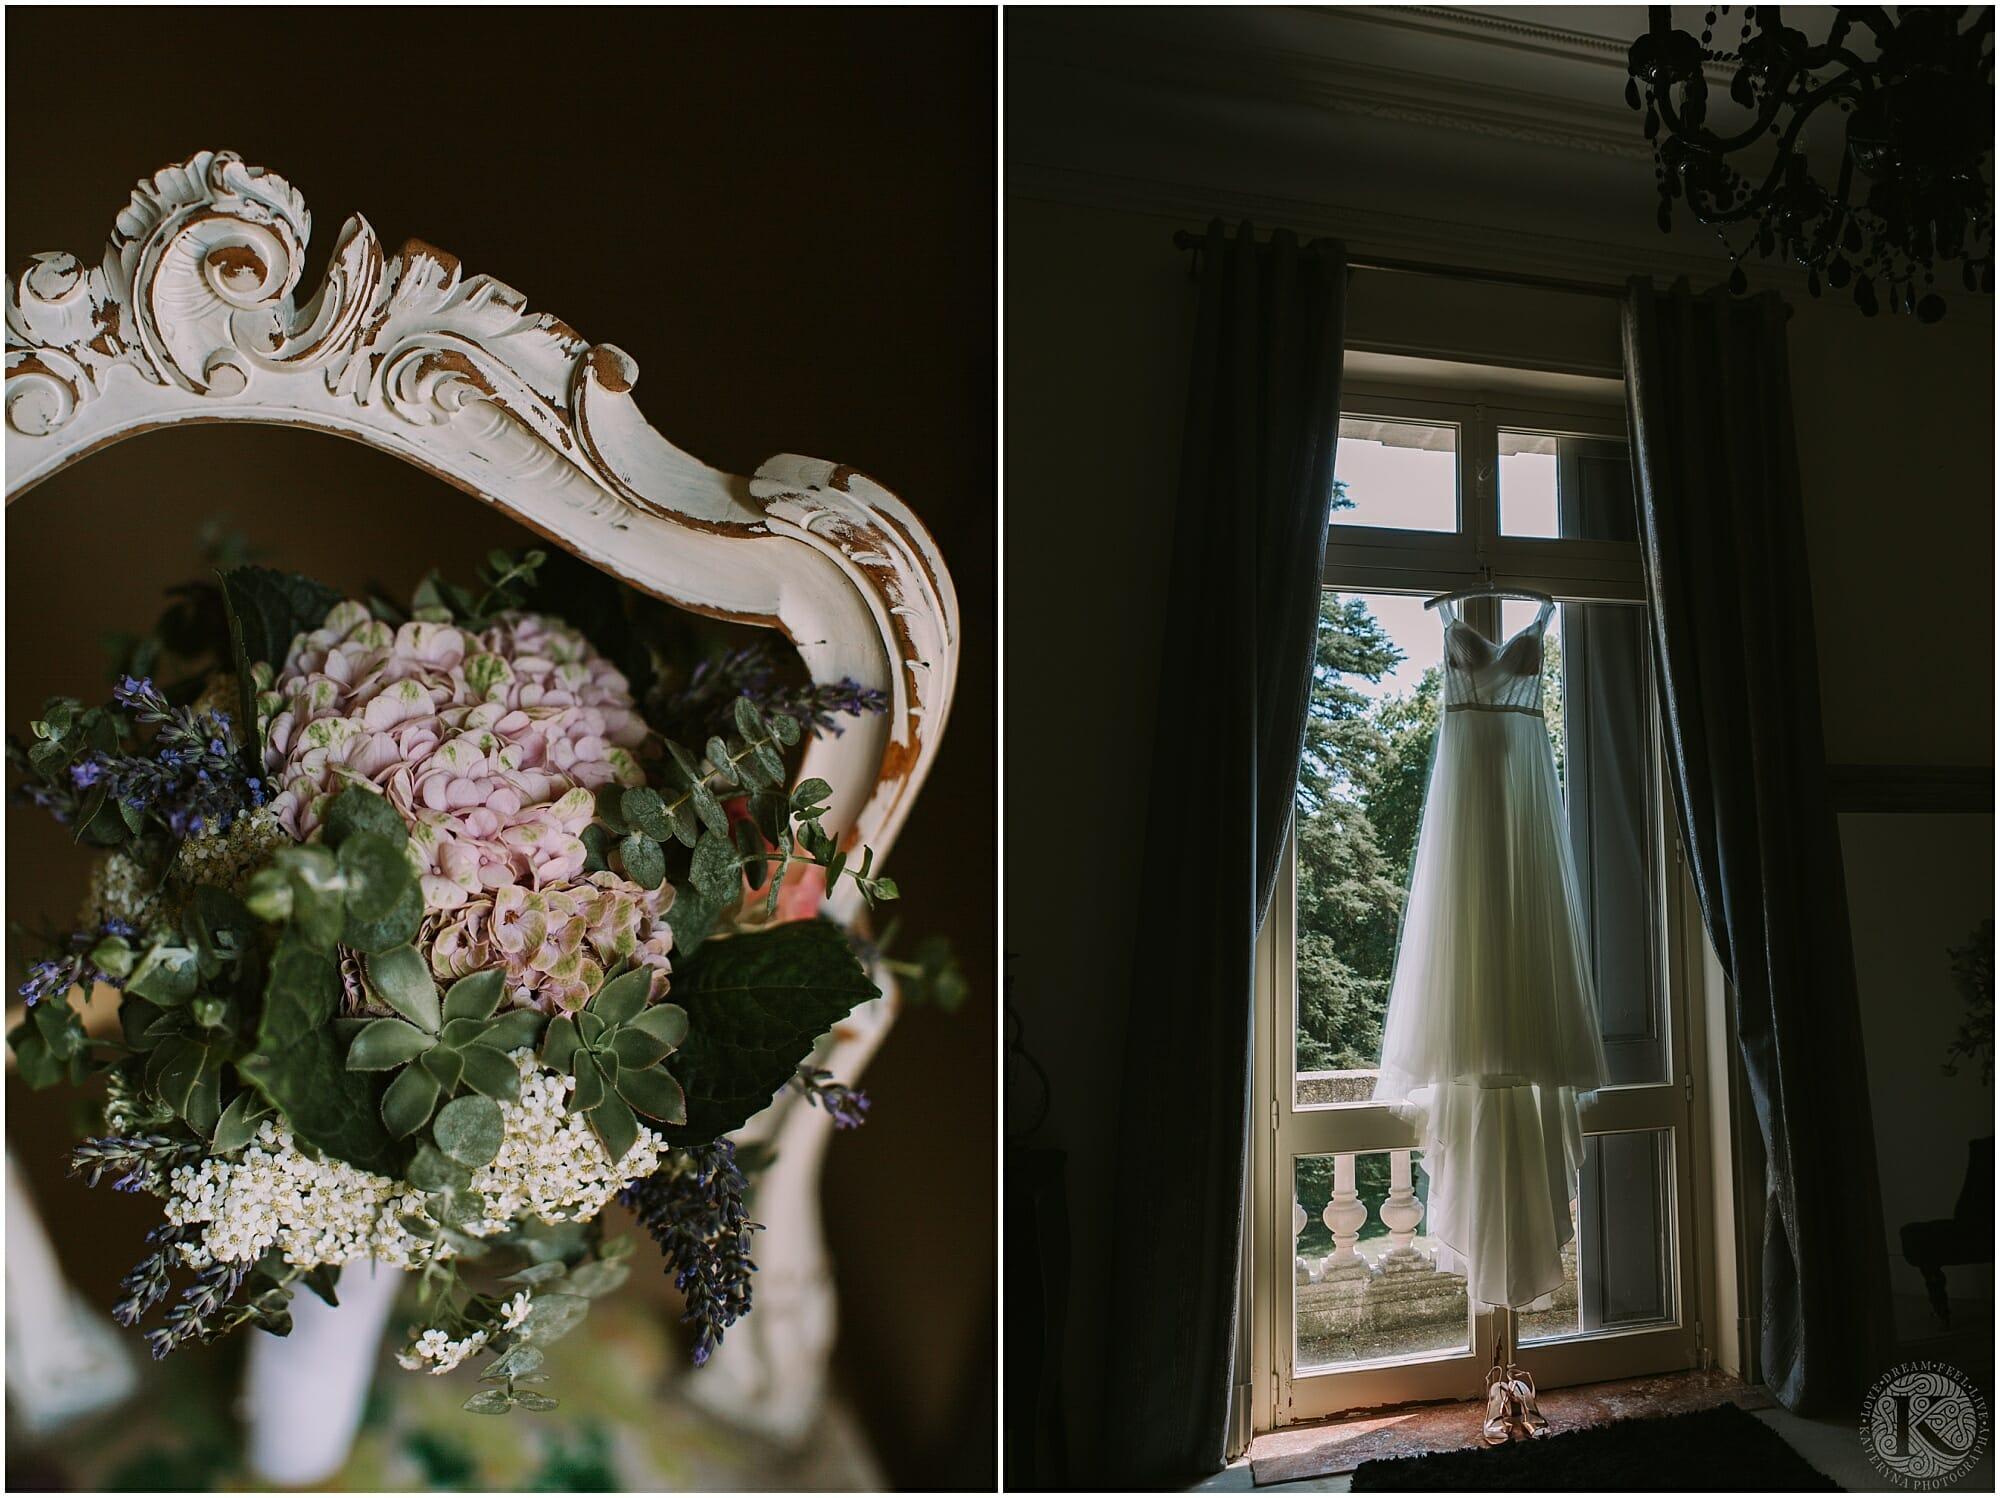 Kateryna-photos-photographe-mariage-chateau-des-3-fontaines-provence-avignon-vaucluse-sud_0017.jpg